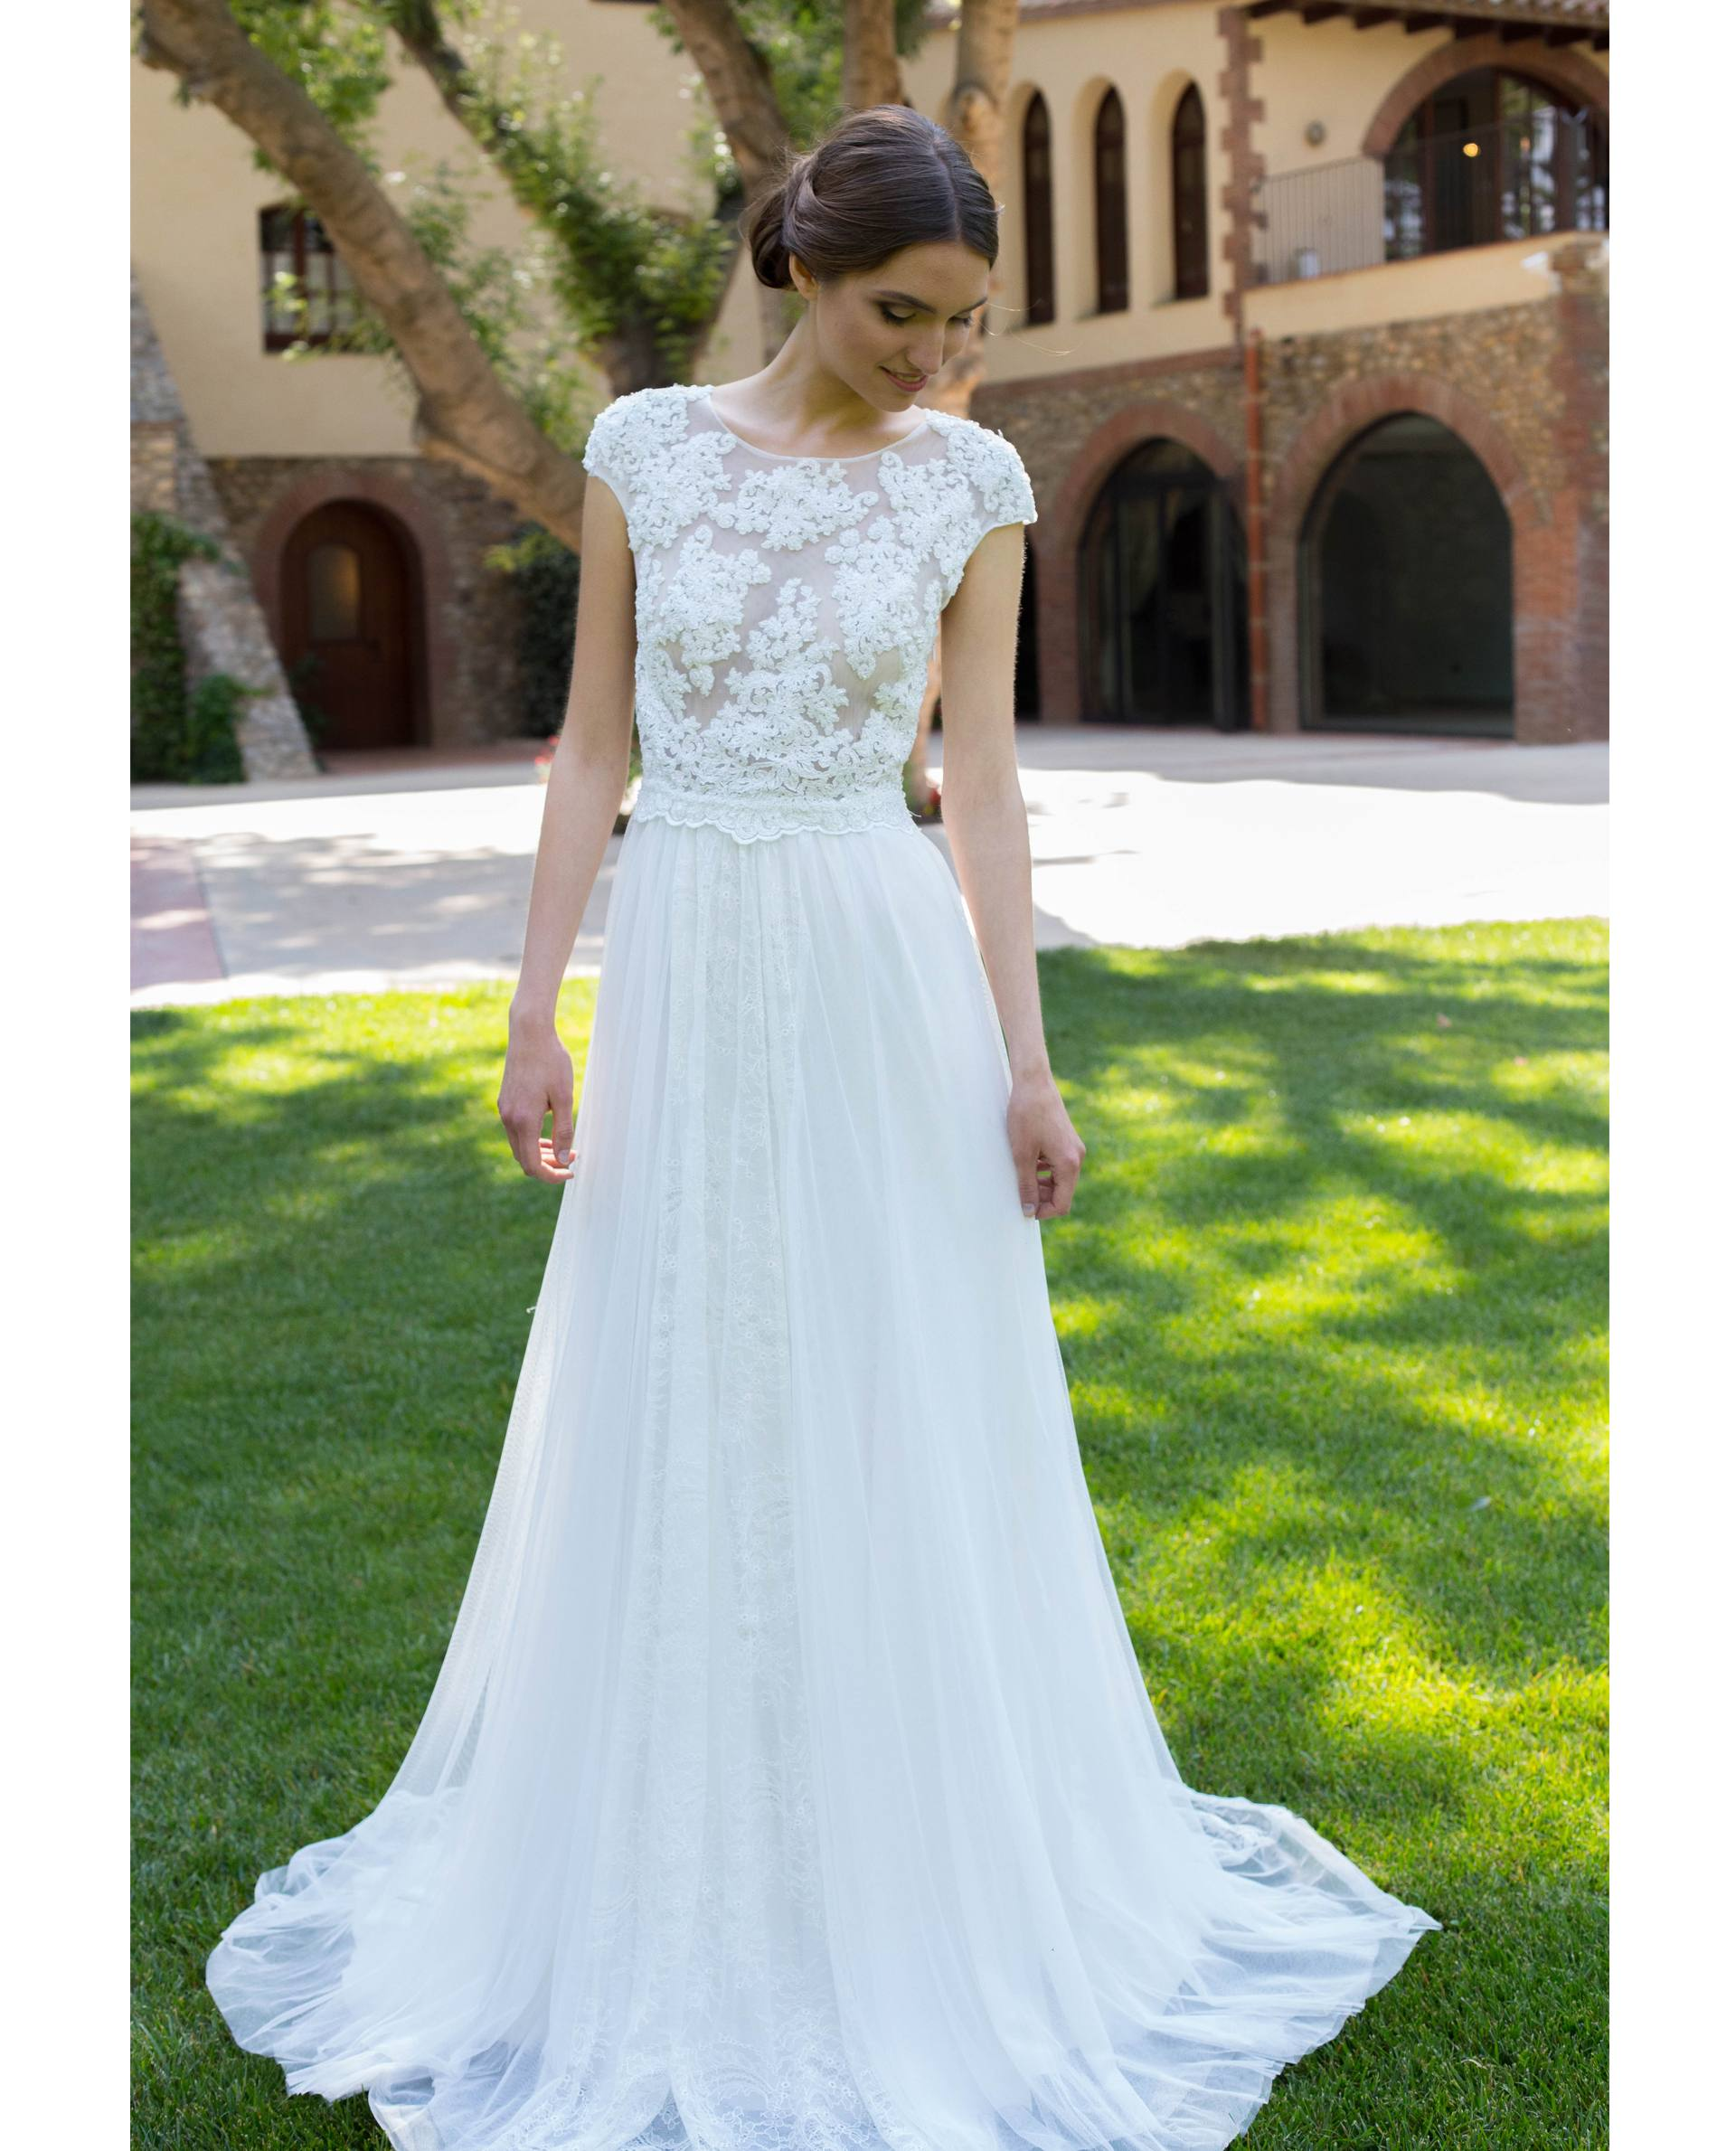 BRIDAL-NATURE 2019 - VESTIDOS - vestido novia Alba